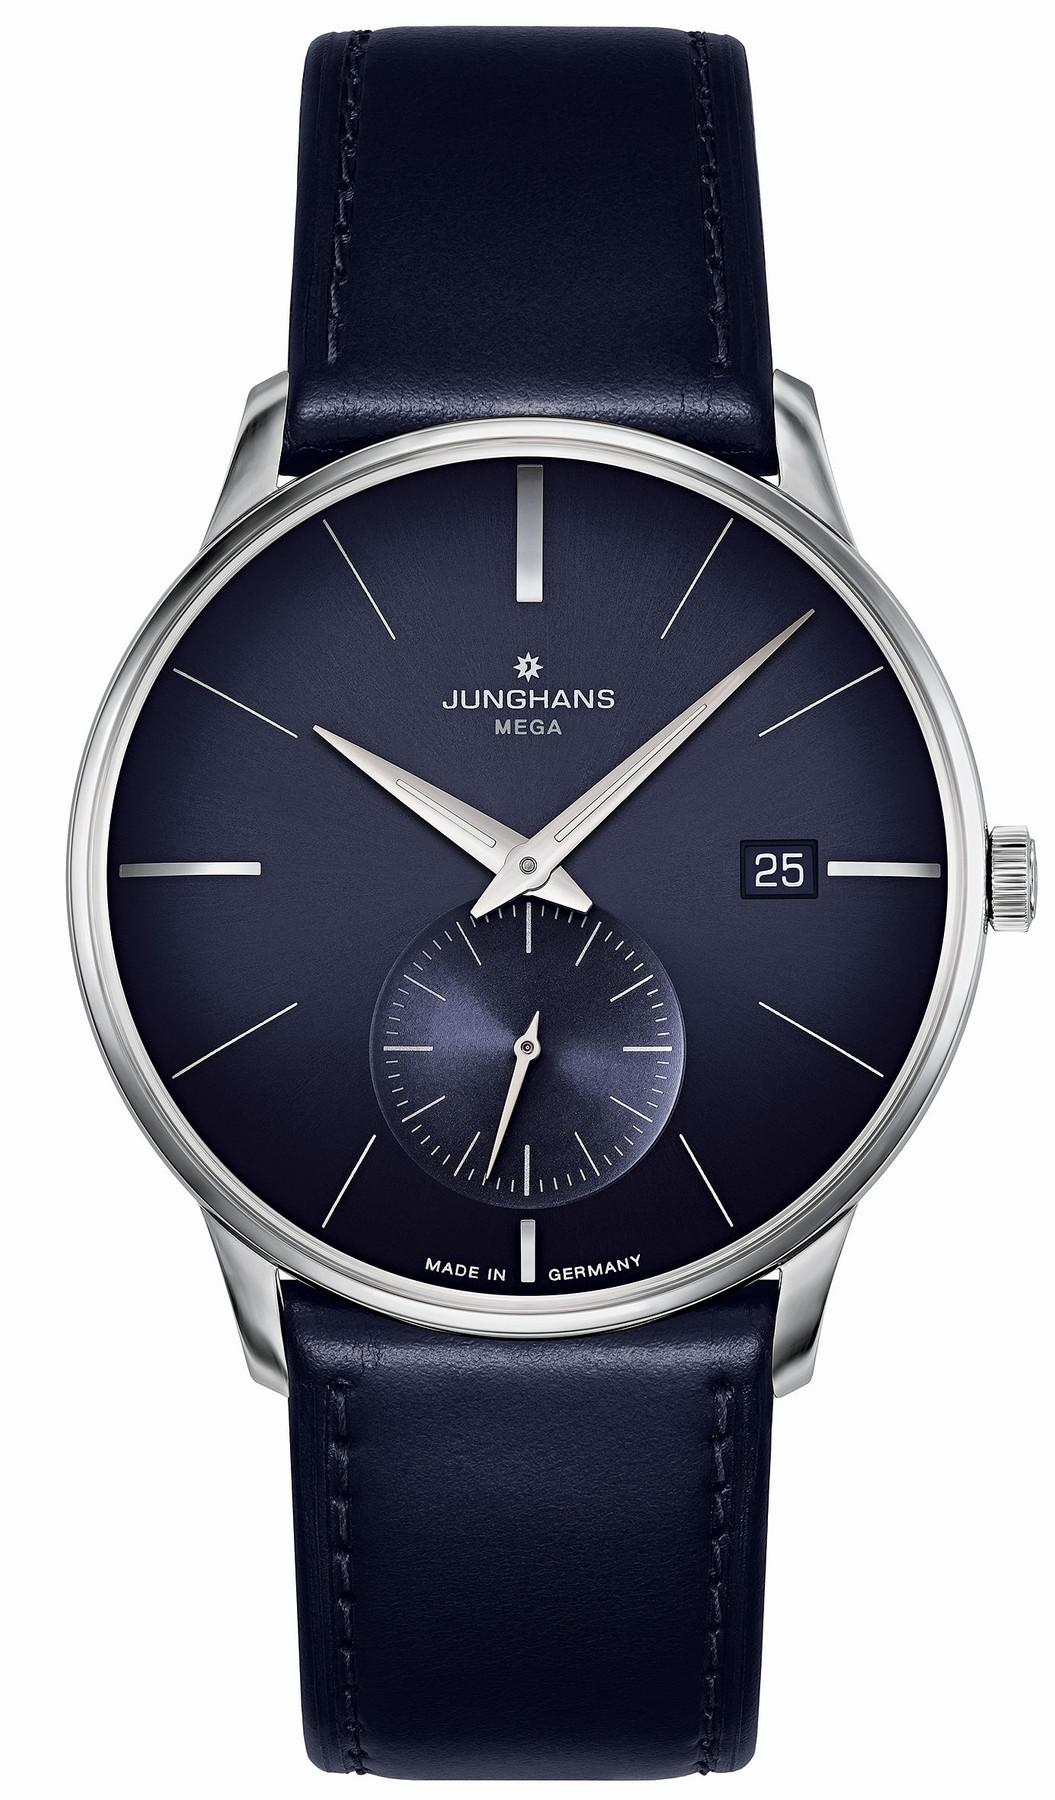 Junghans Meister MEGA Kleine Sekunde Funk Armbanduhr 058/4901.00